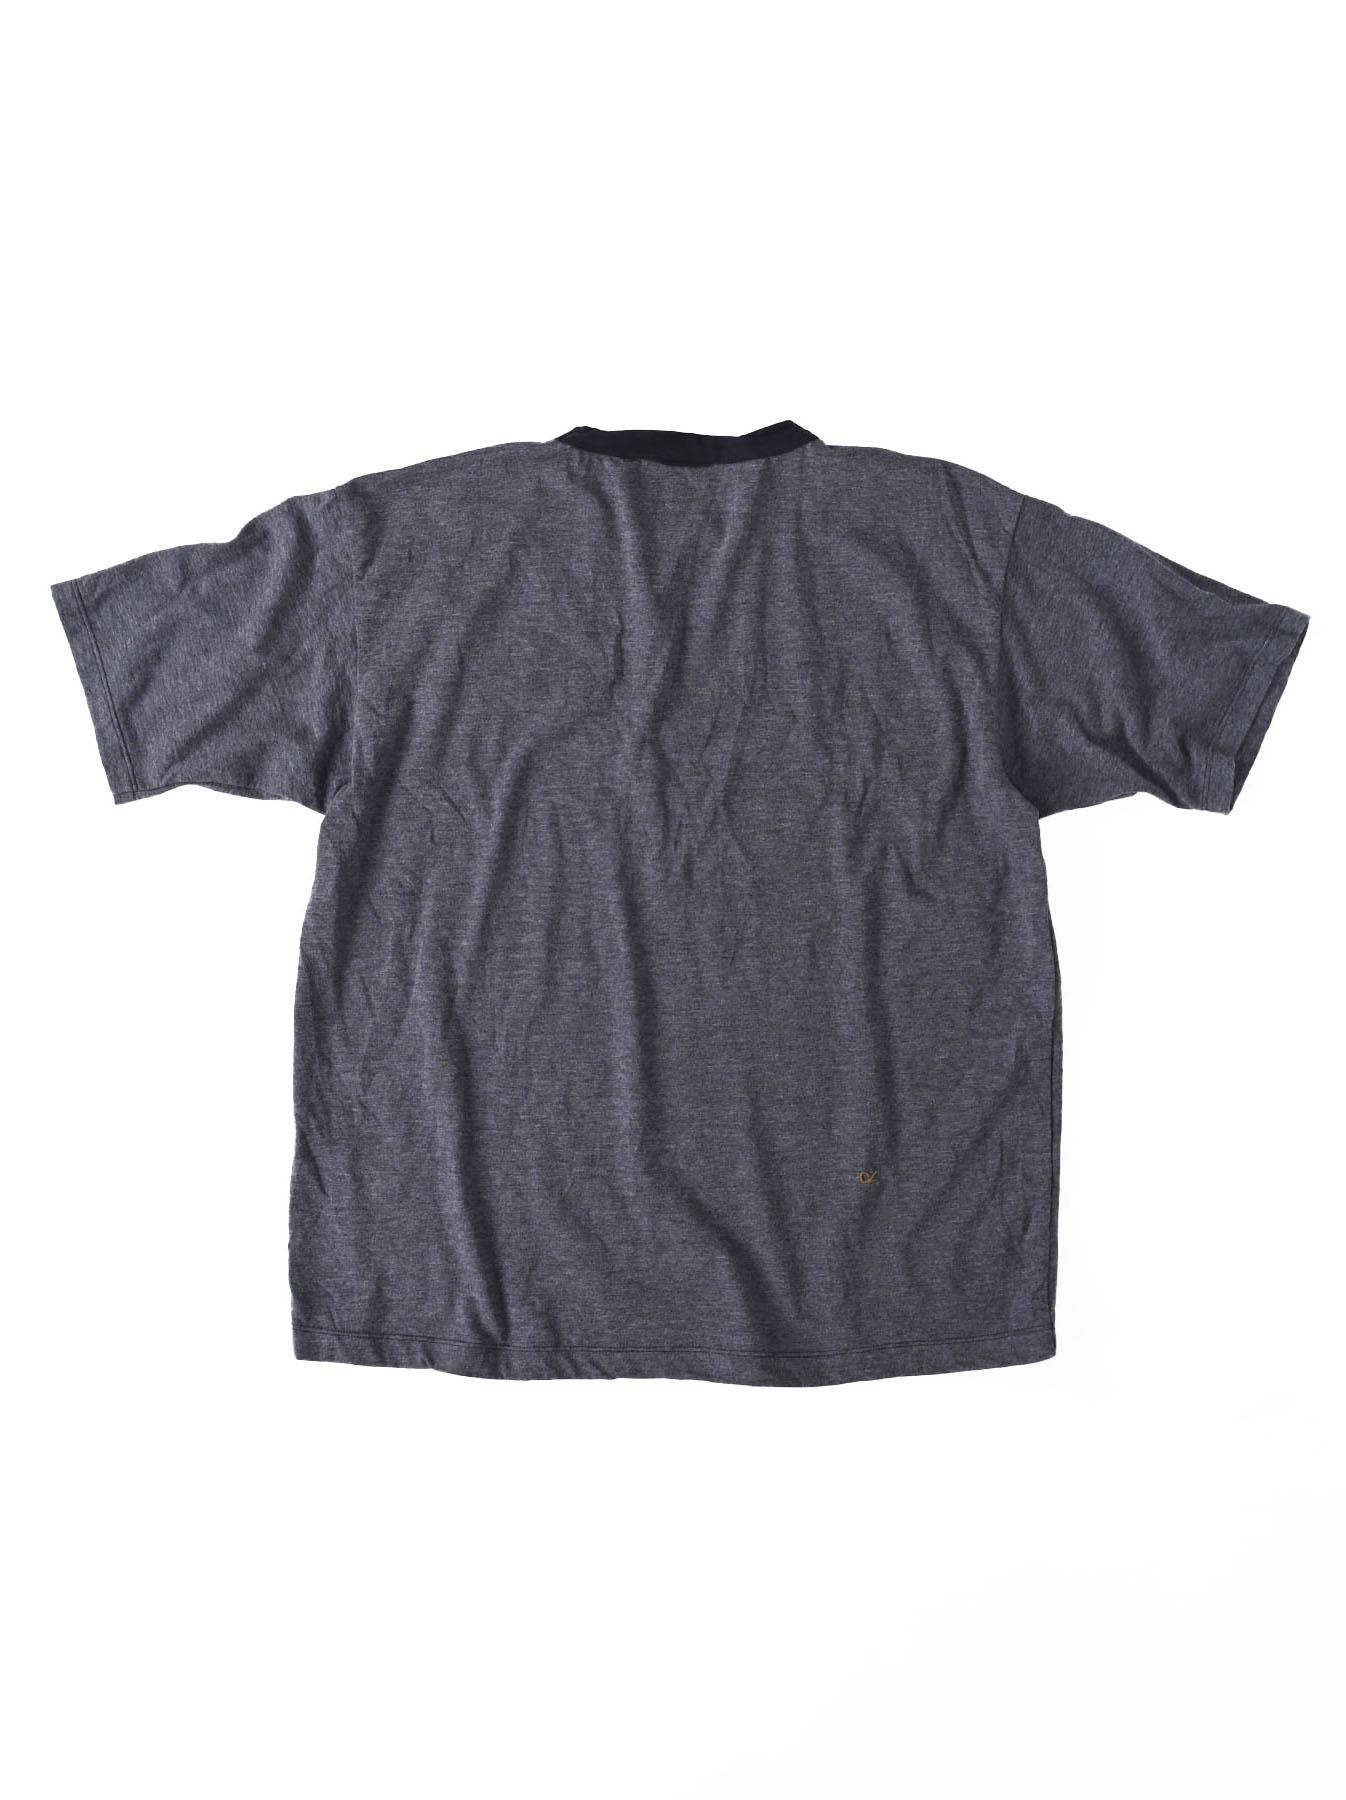 US Tenjiku Paddling 908 Ocean T-Shirt (0521)-7